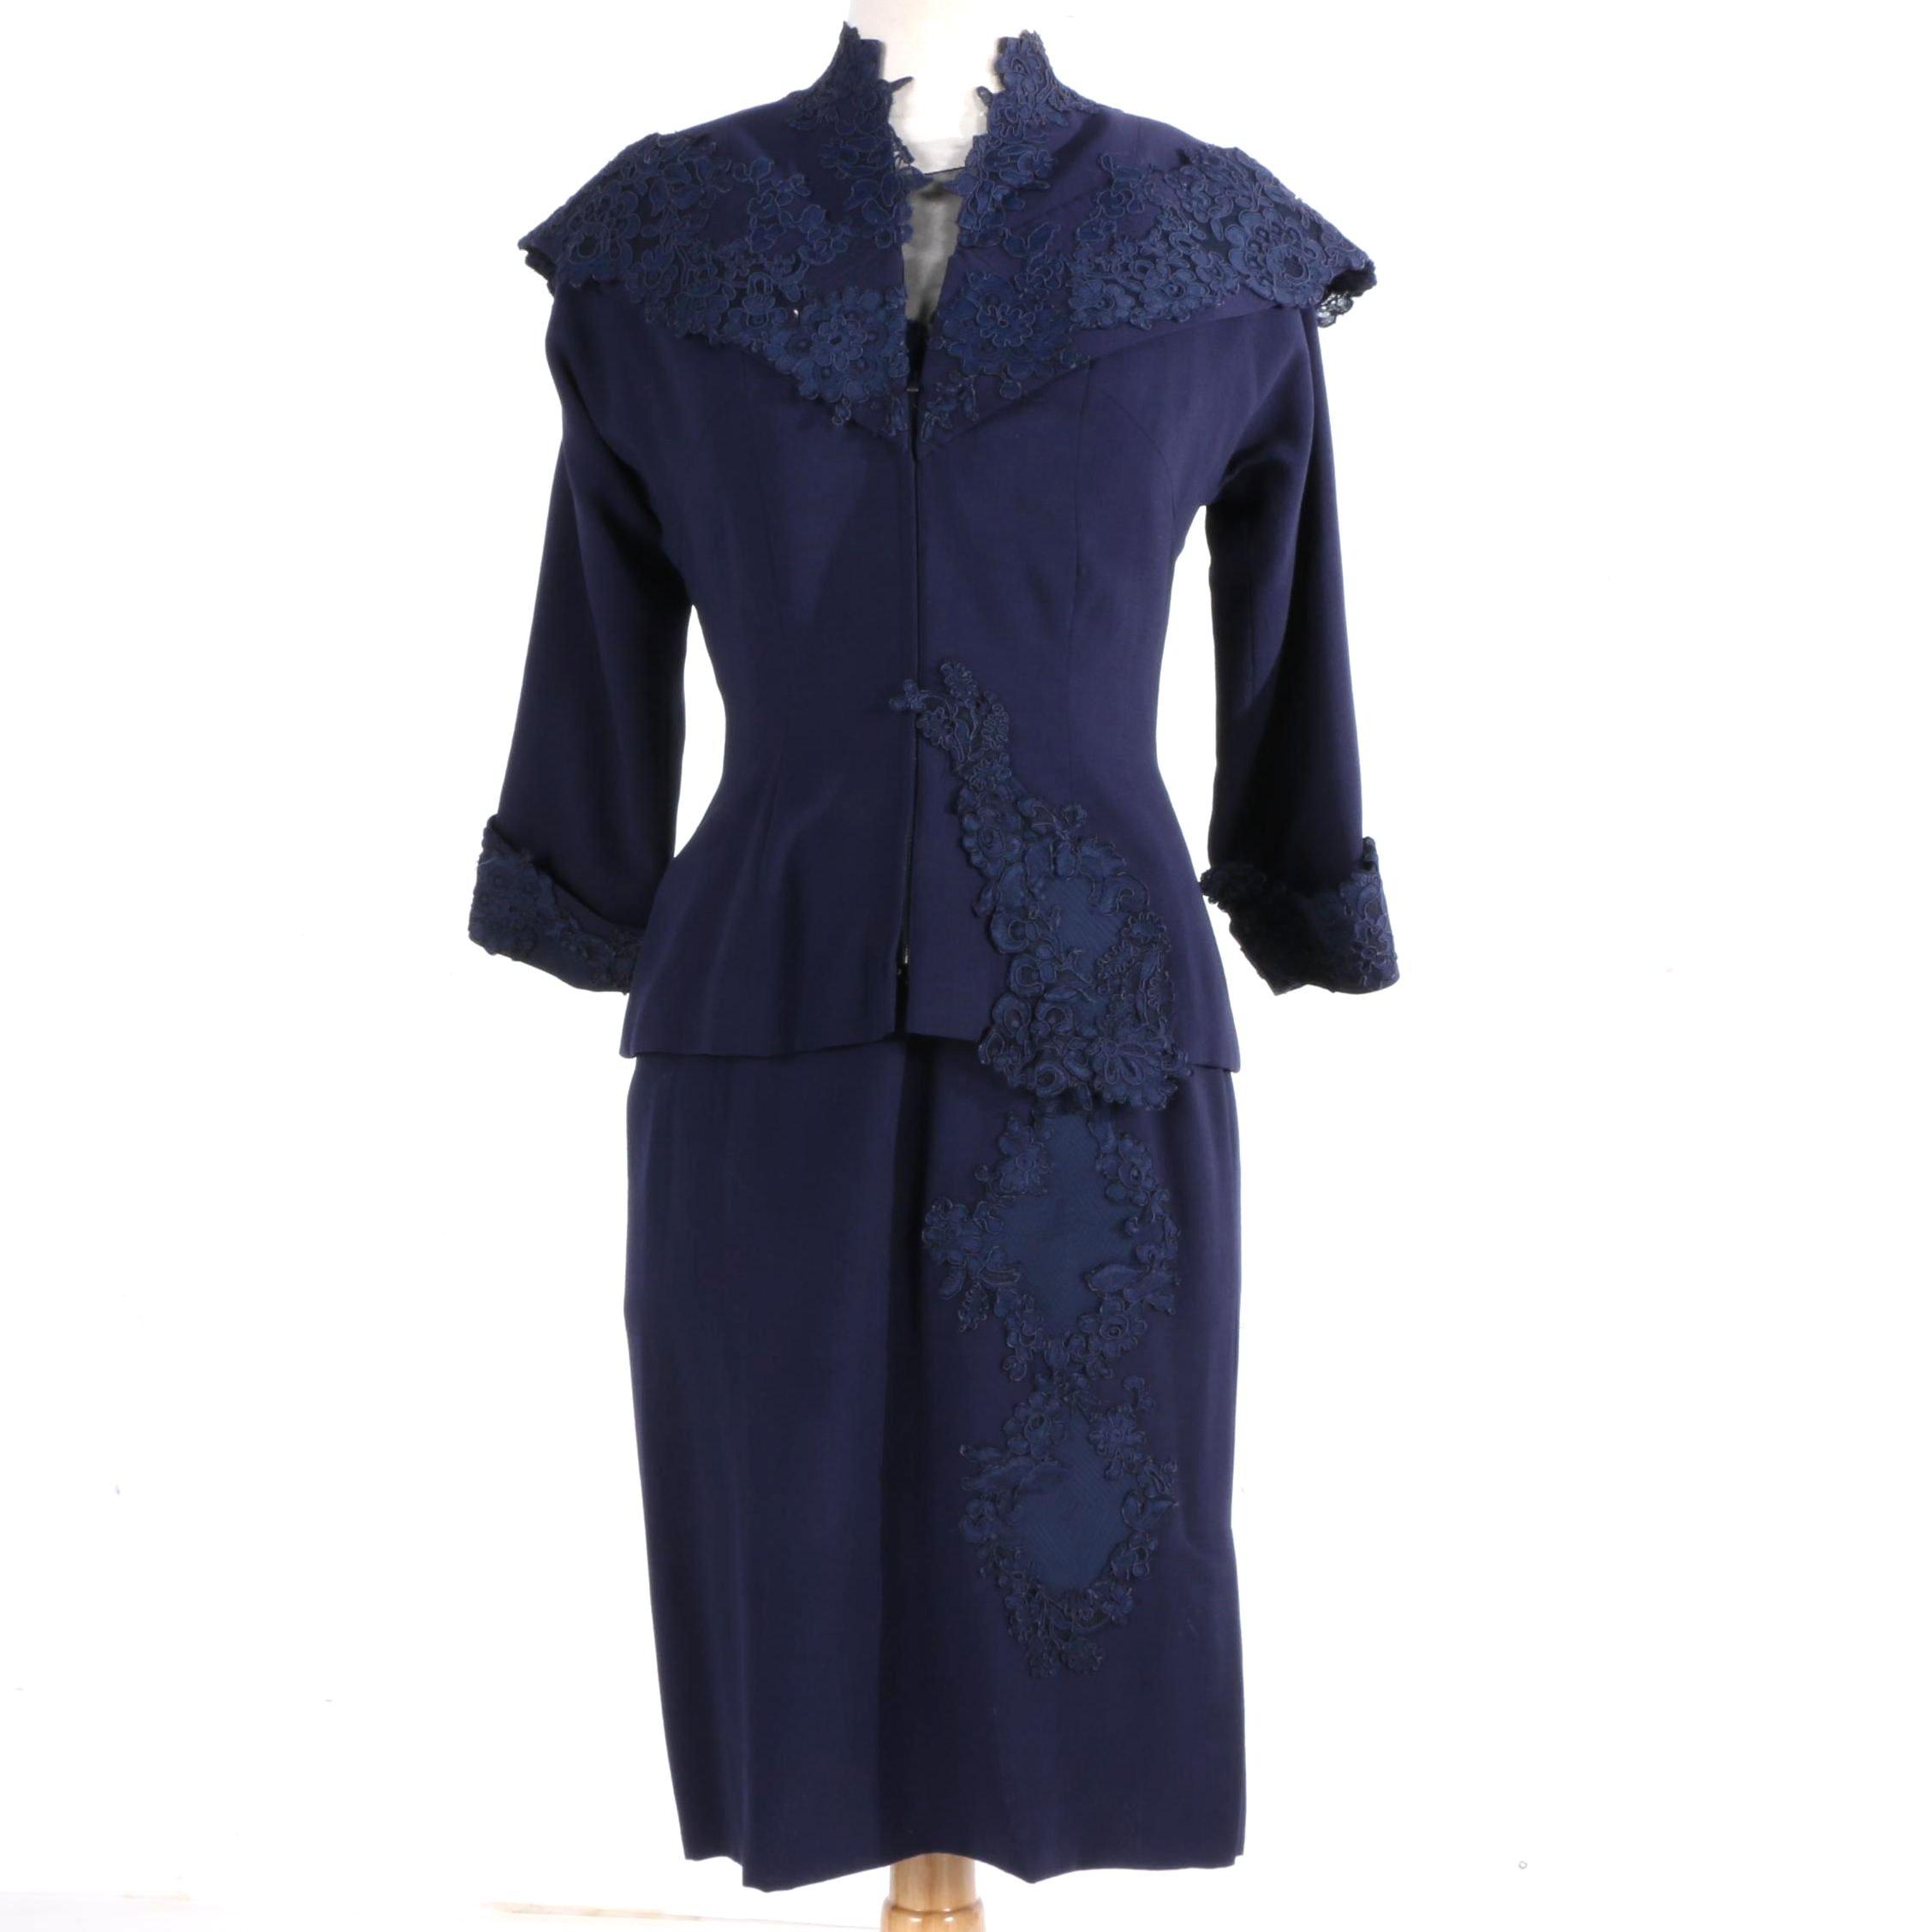 Vintage Circa 1950s Navy Blue Dress Set